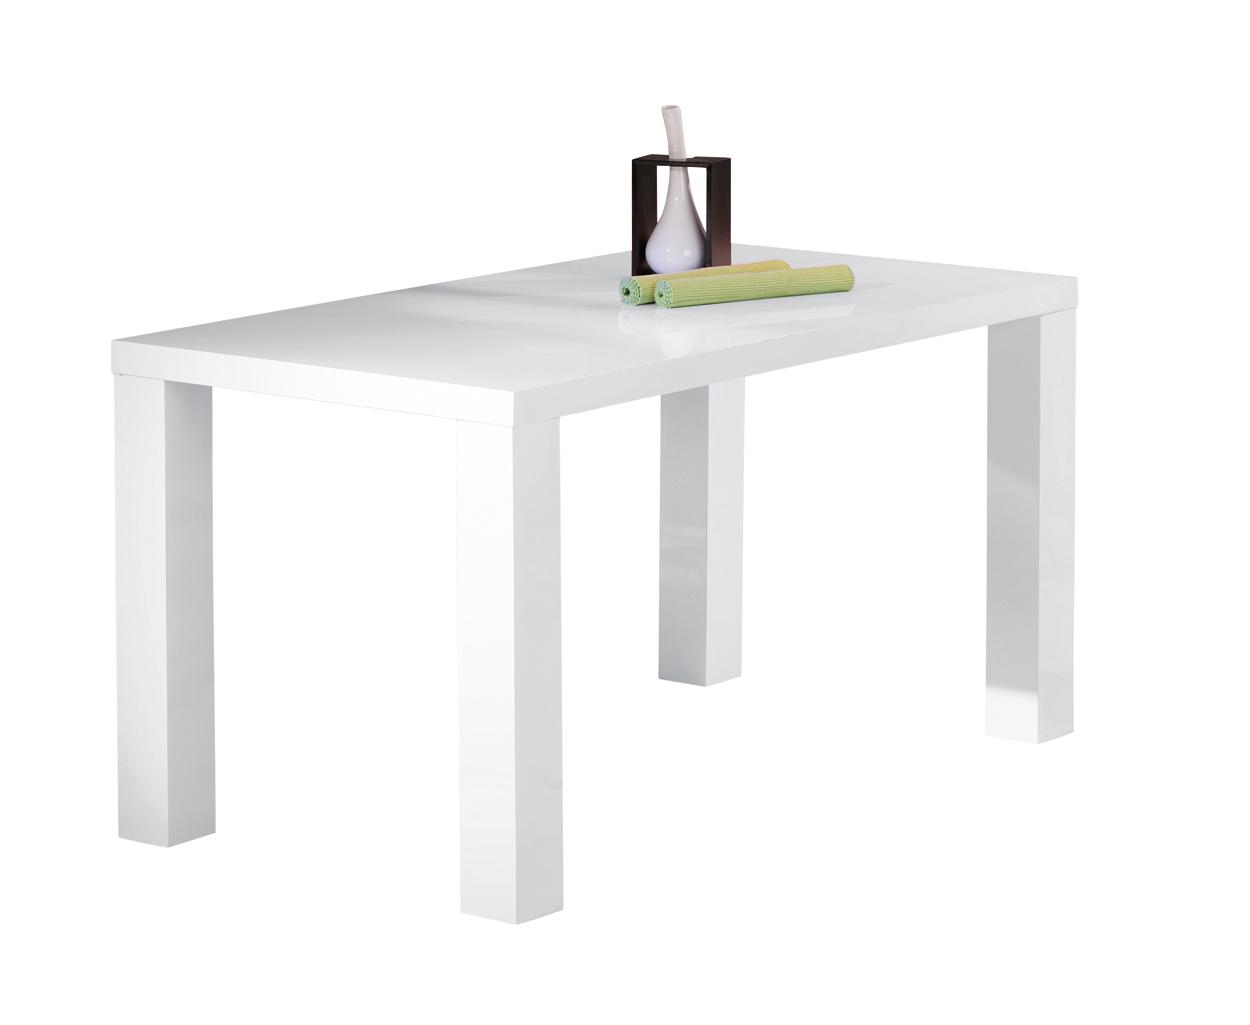 Tavolo moderno bianco moris mobile per cucina sala da pranzo for Tavolo cucina moderno bianco